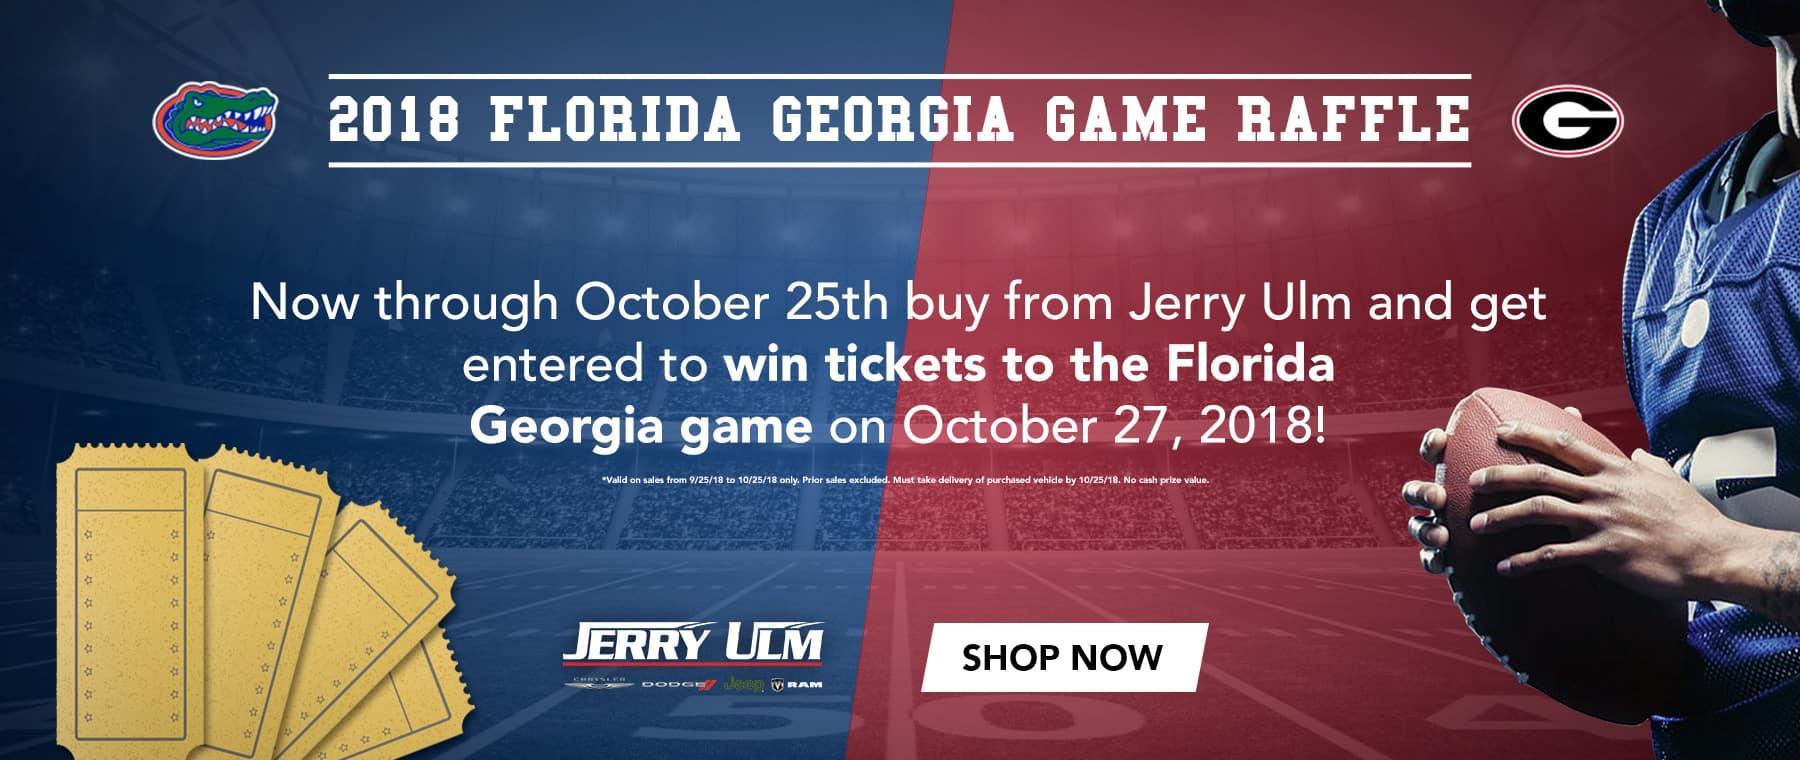 FL GA Game Promo